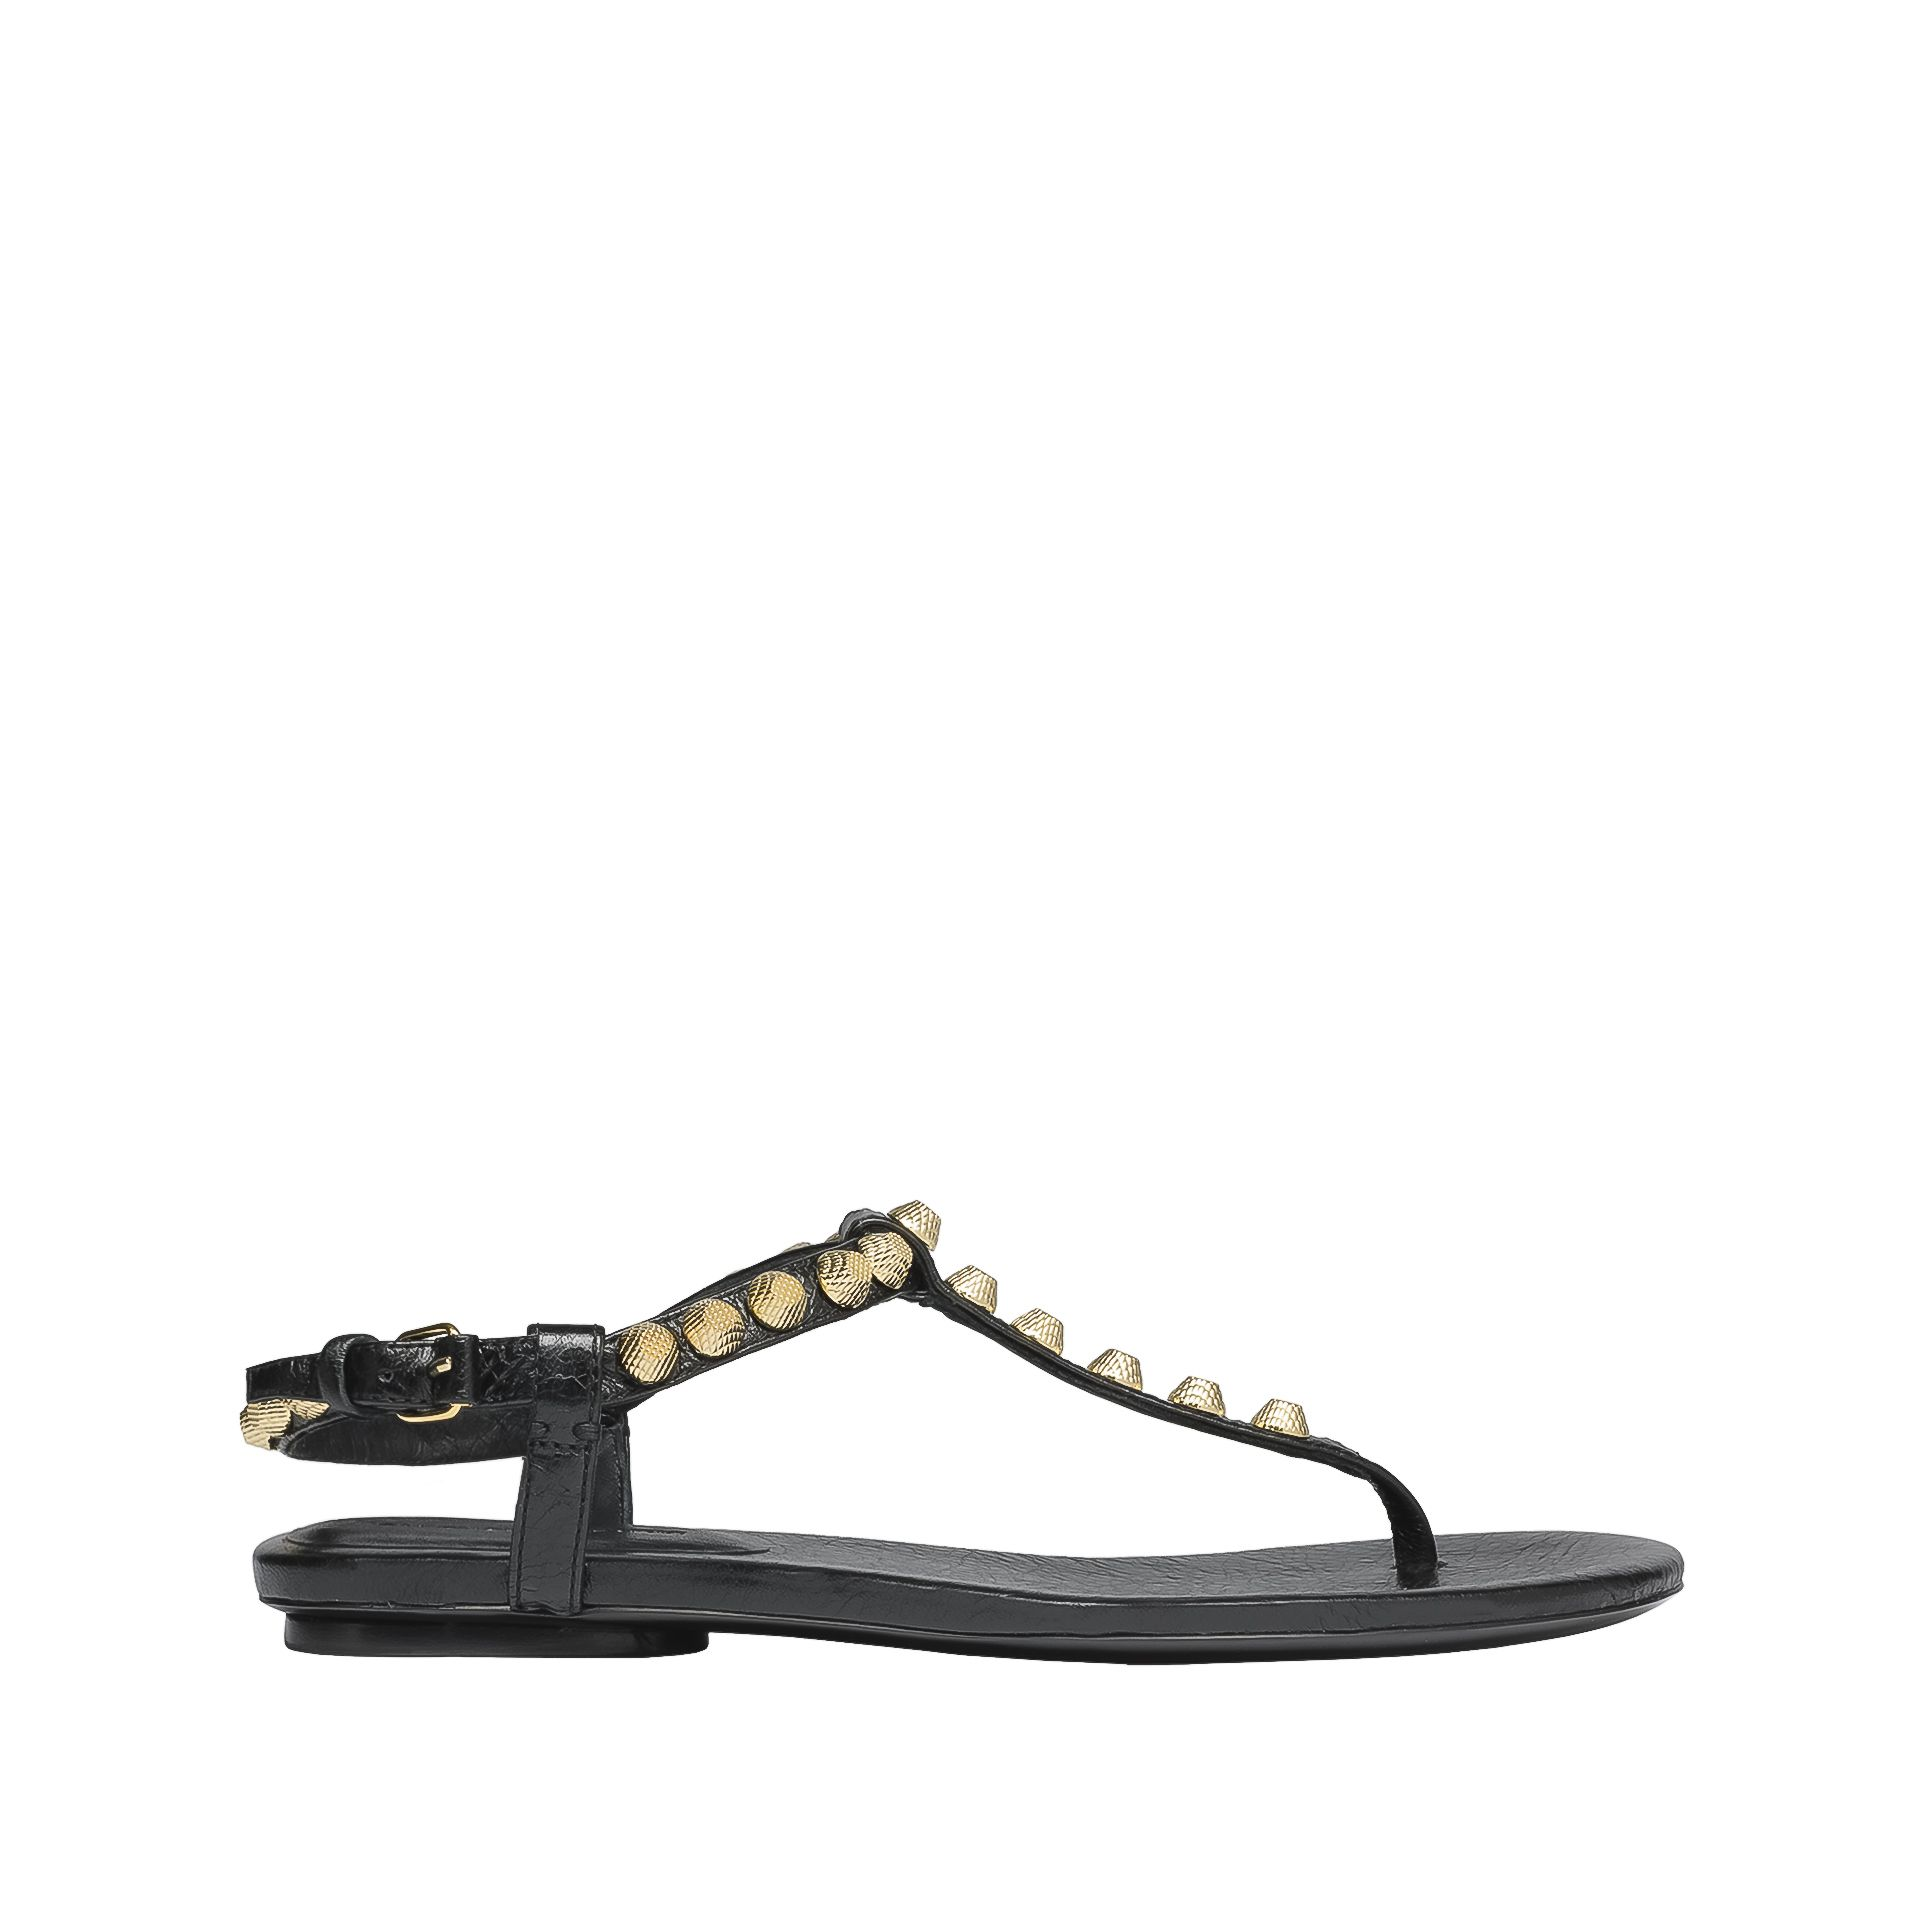 BALENCIAGA Balenciaga Giant Gold T Strap Sandals Sandal D f